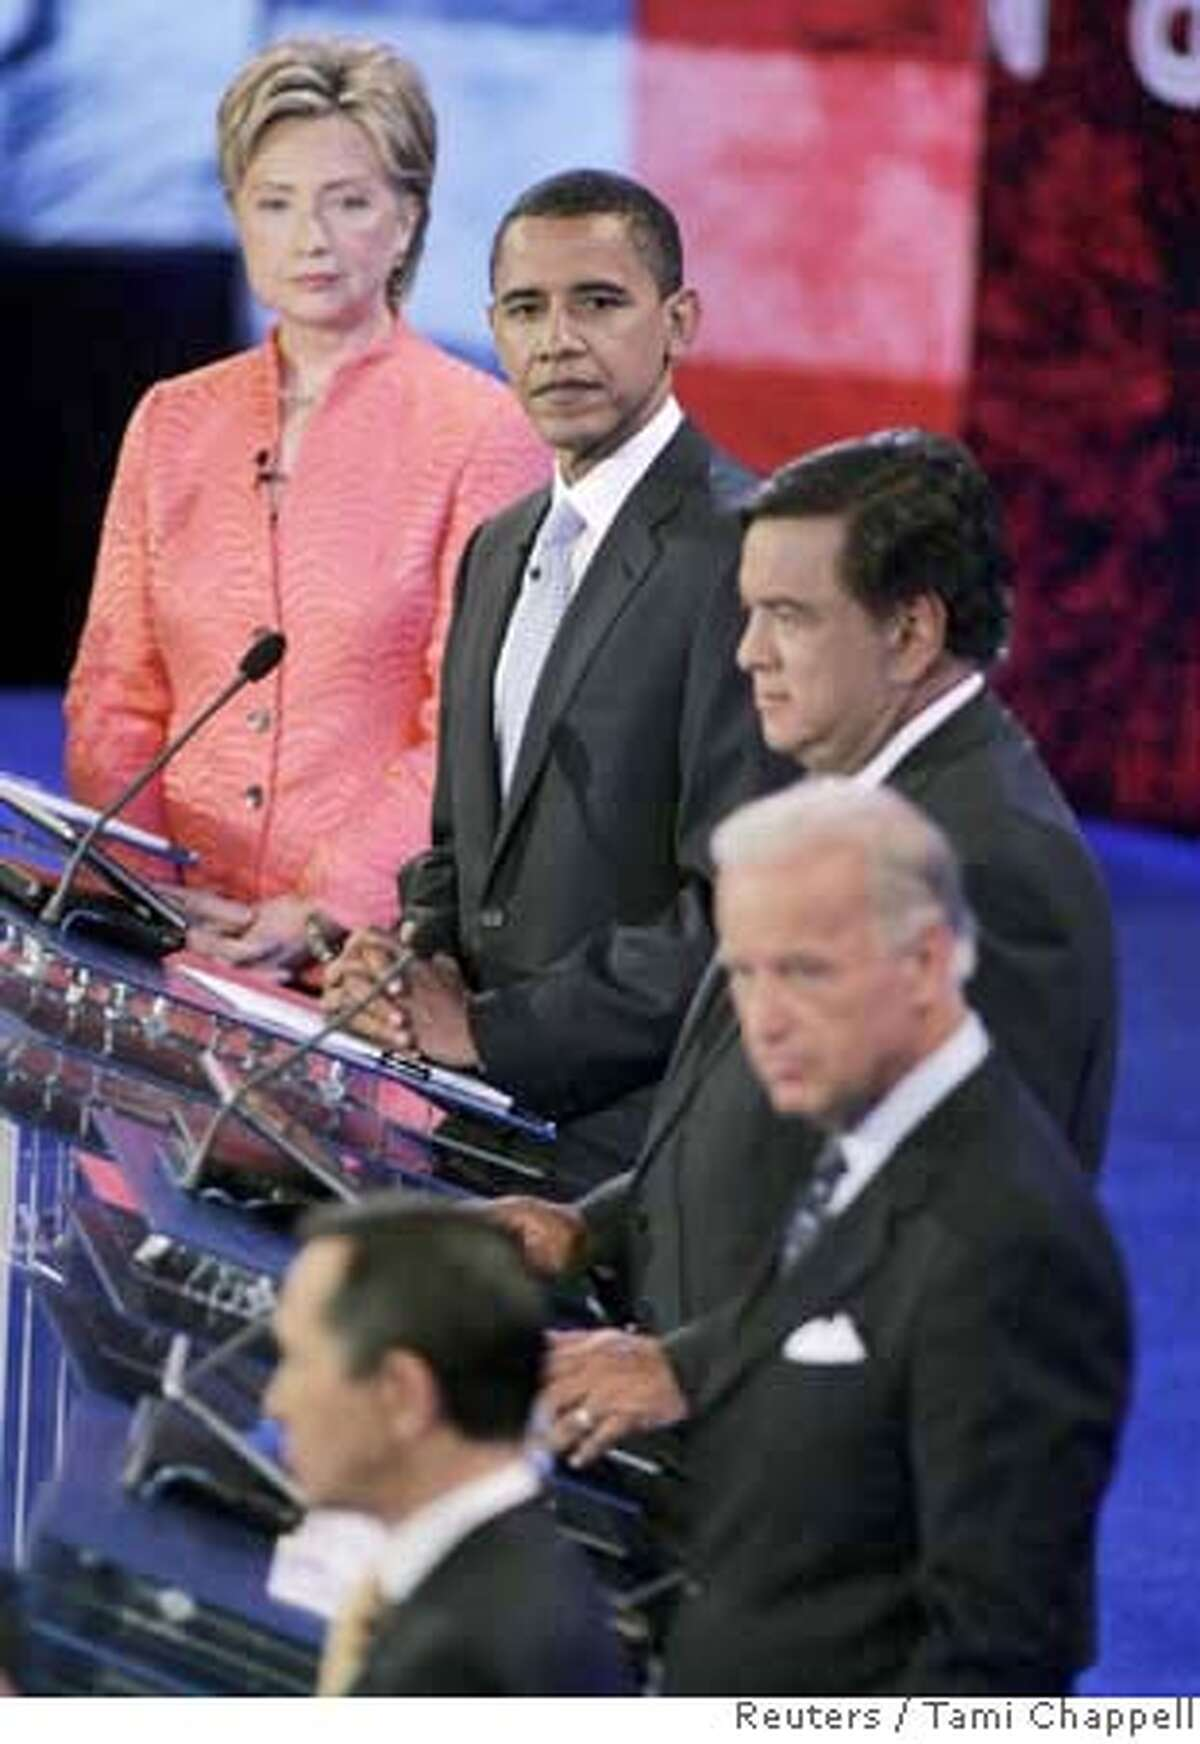 Democratic candidates listen during the CNN/YouTube democratic candidates debate in Charleston, South Carolina on the campus of The Citadel July 23, 2007. From (L-R) U.S. Senator Hillary Clinton (D-NY), U.S. Senator Barack Obama (D-IL), New Mexico Governor Bill Richardson, U.S. Senator Joe Biden (D-DE) and U.S. Congressman Dennis Kucinich (D-OH) (bottom). REUTERS/Tami Chappell (UNITED STATES)